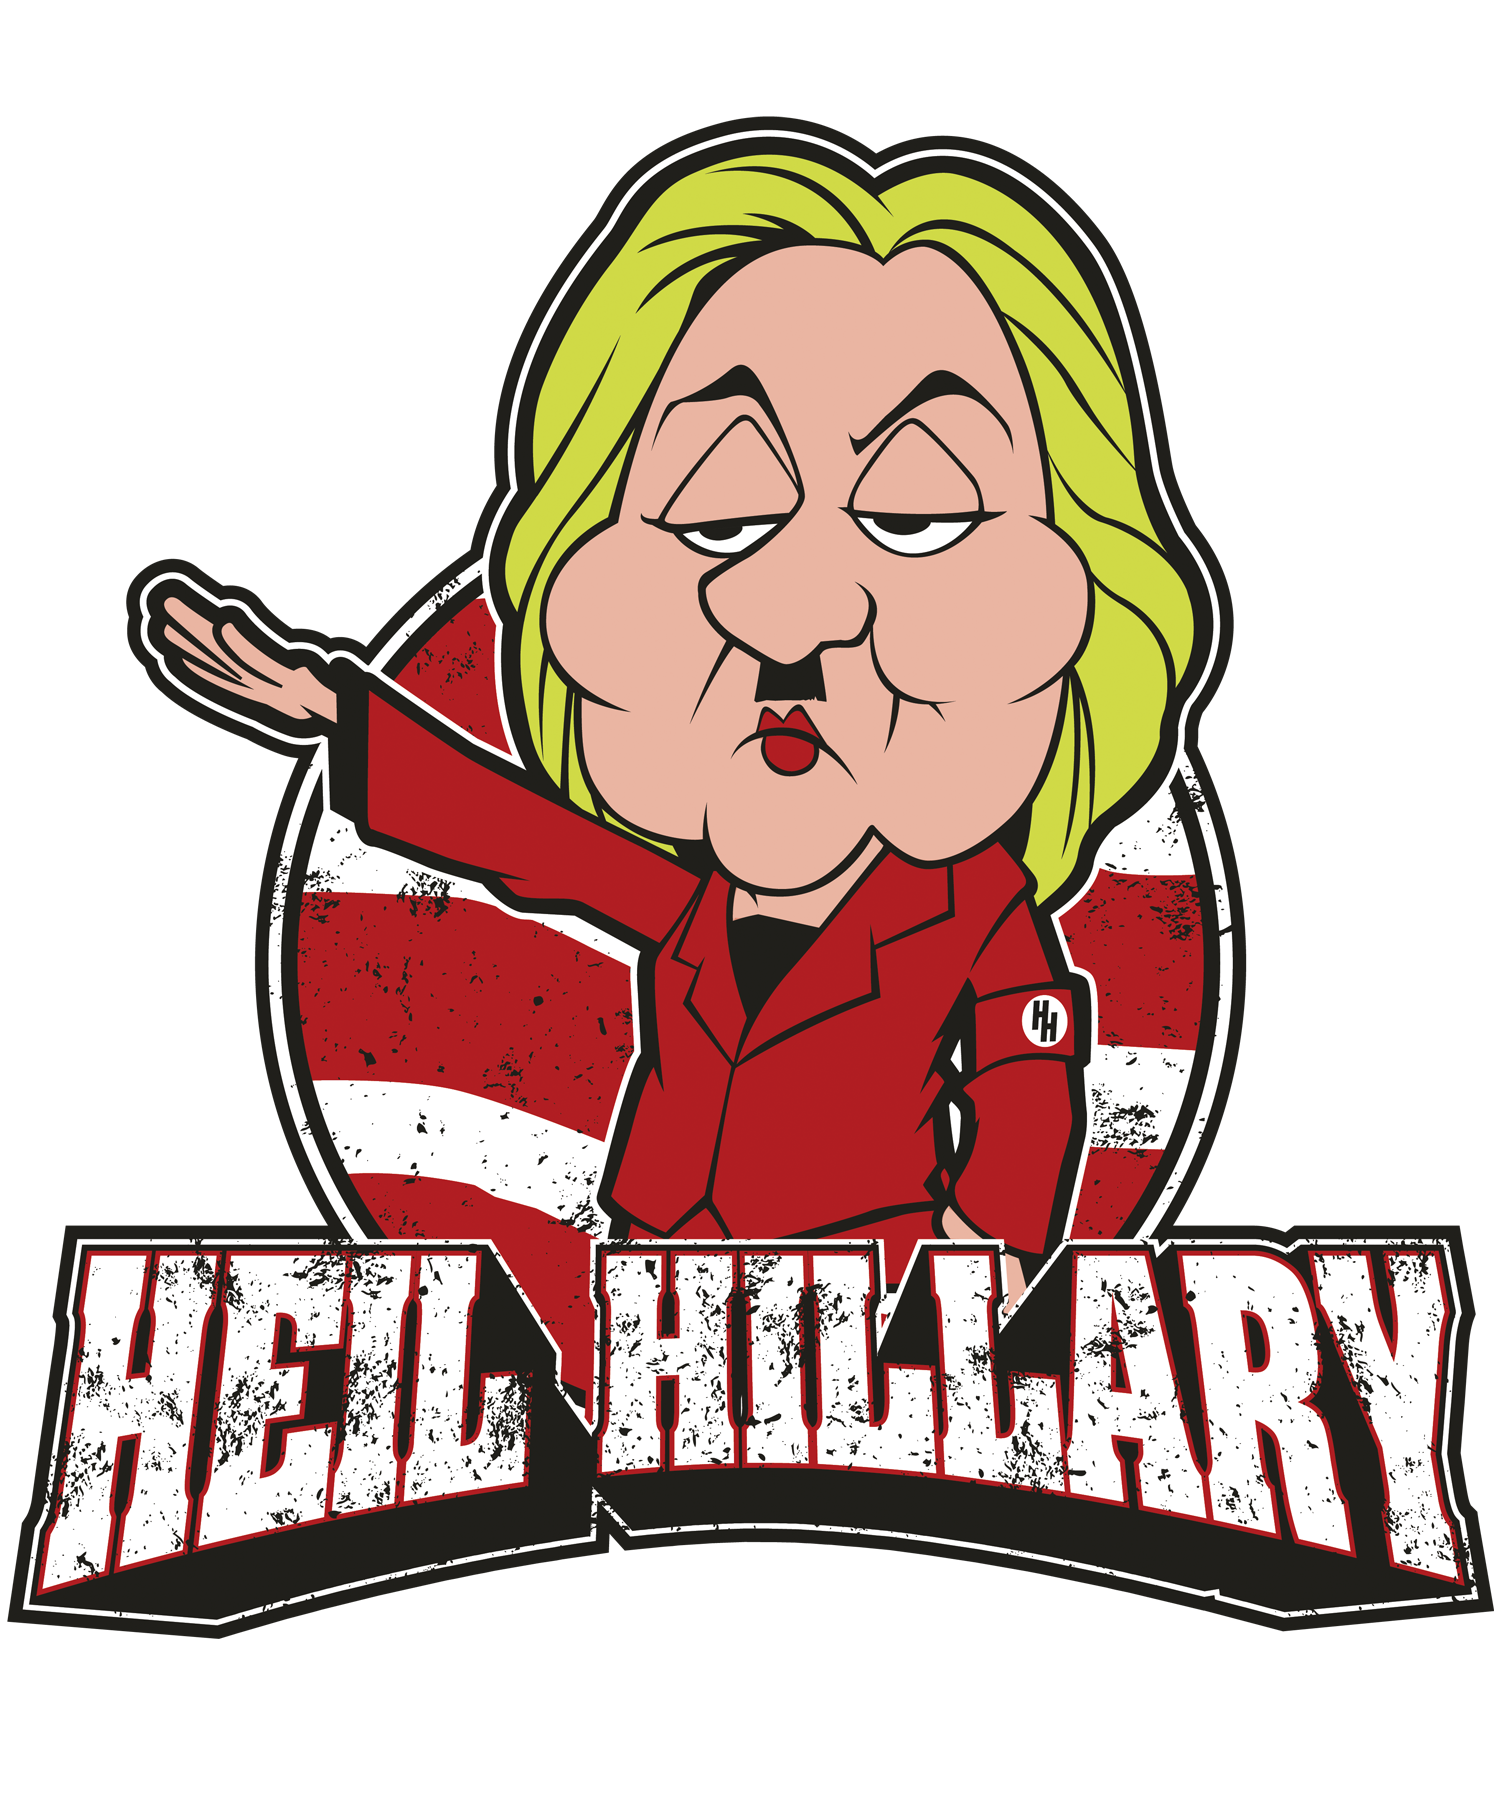 HEIL HILLARY.